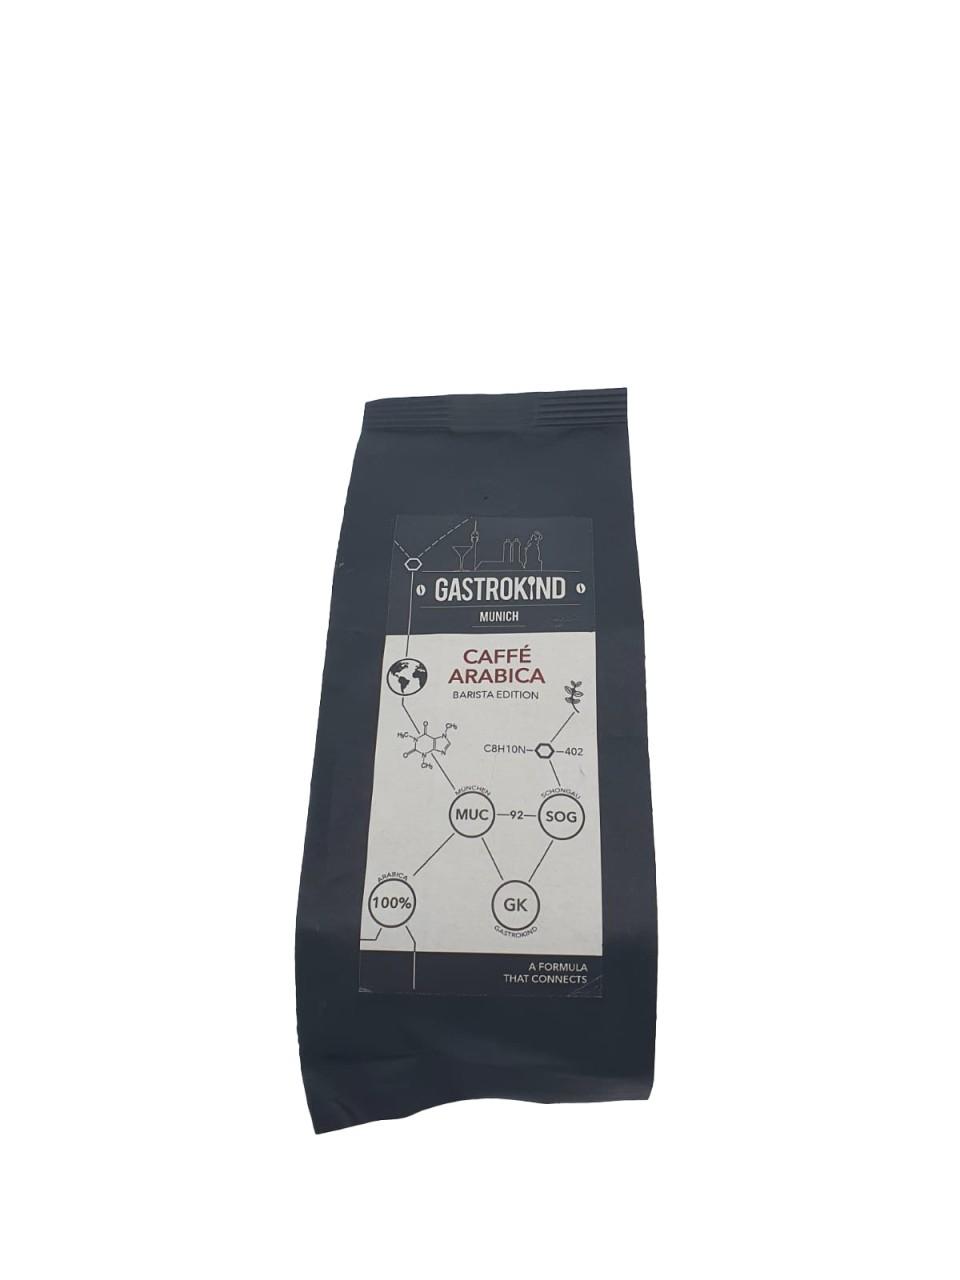 Gastrokind Caffé Arabica Barista Edition 250 g gemahlen